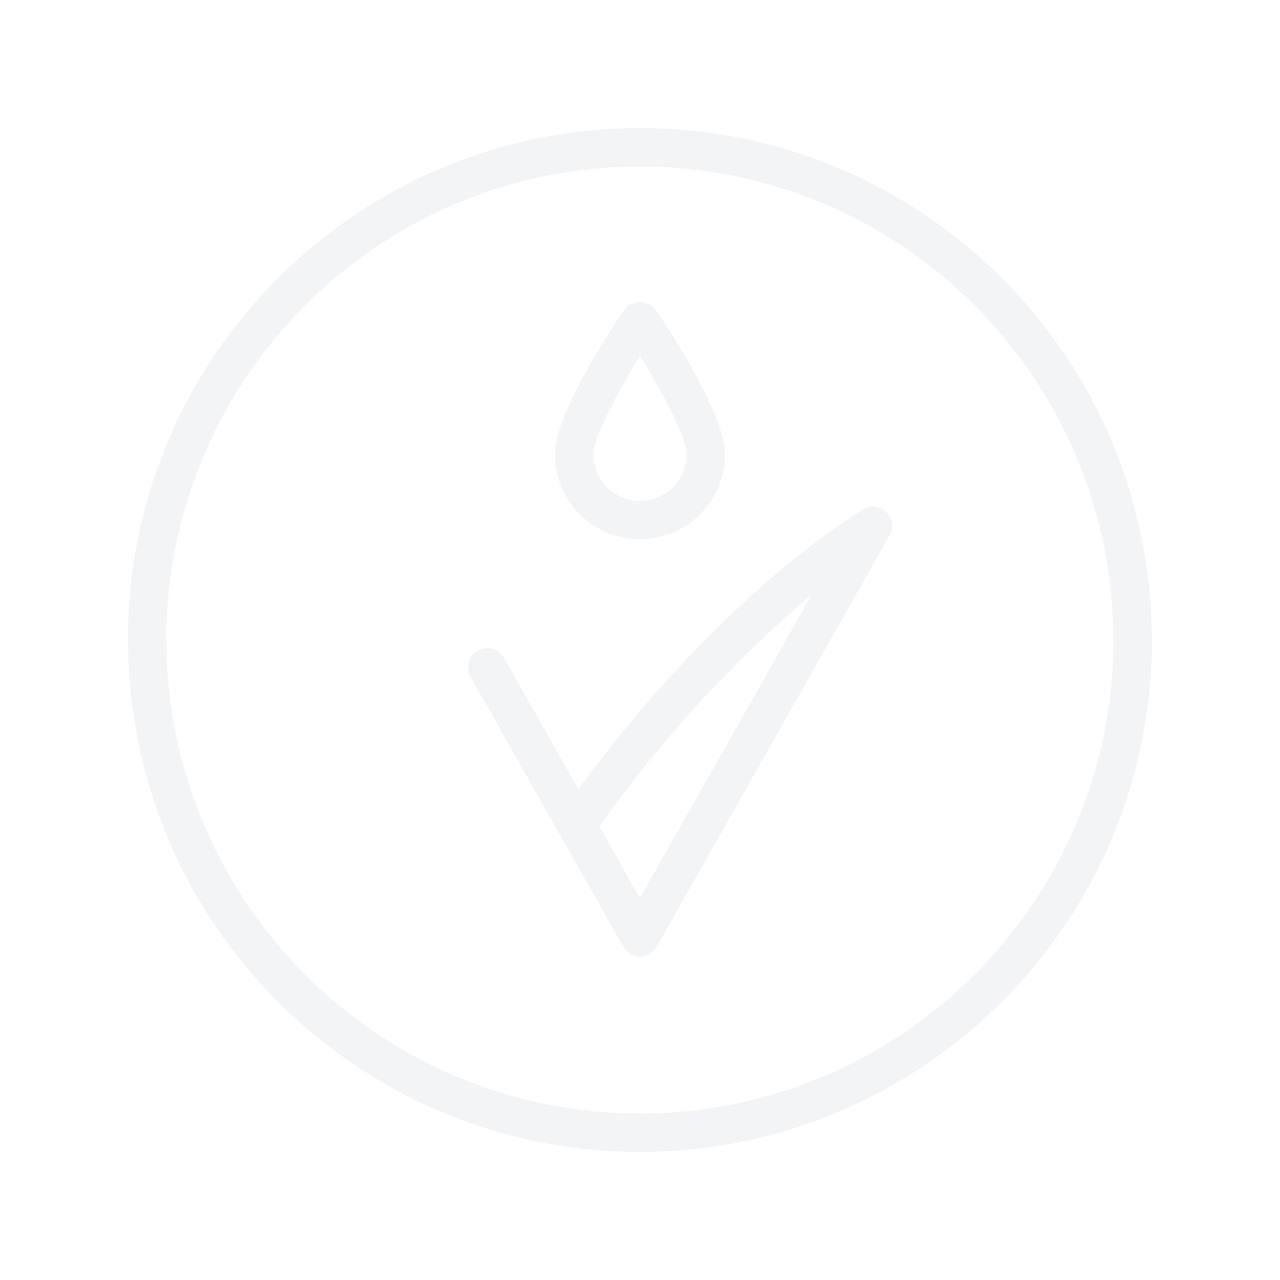 JOICO Vero K-Pak Color Intensity Magenta 118ml